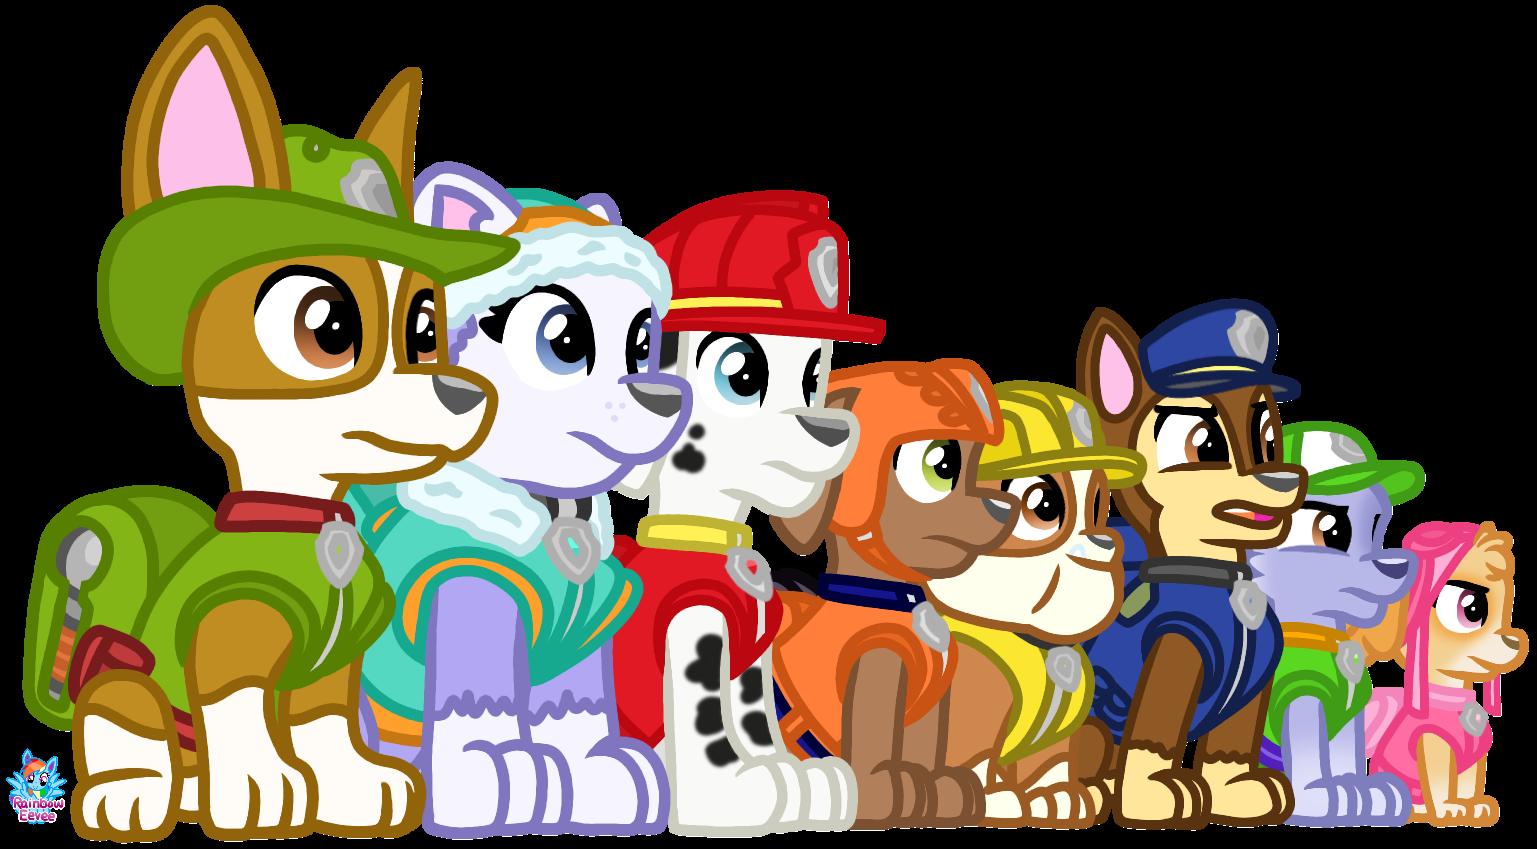 the paw patrol complete by rainboweevee da on deviantart the paw patrol complete by rainboweevee